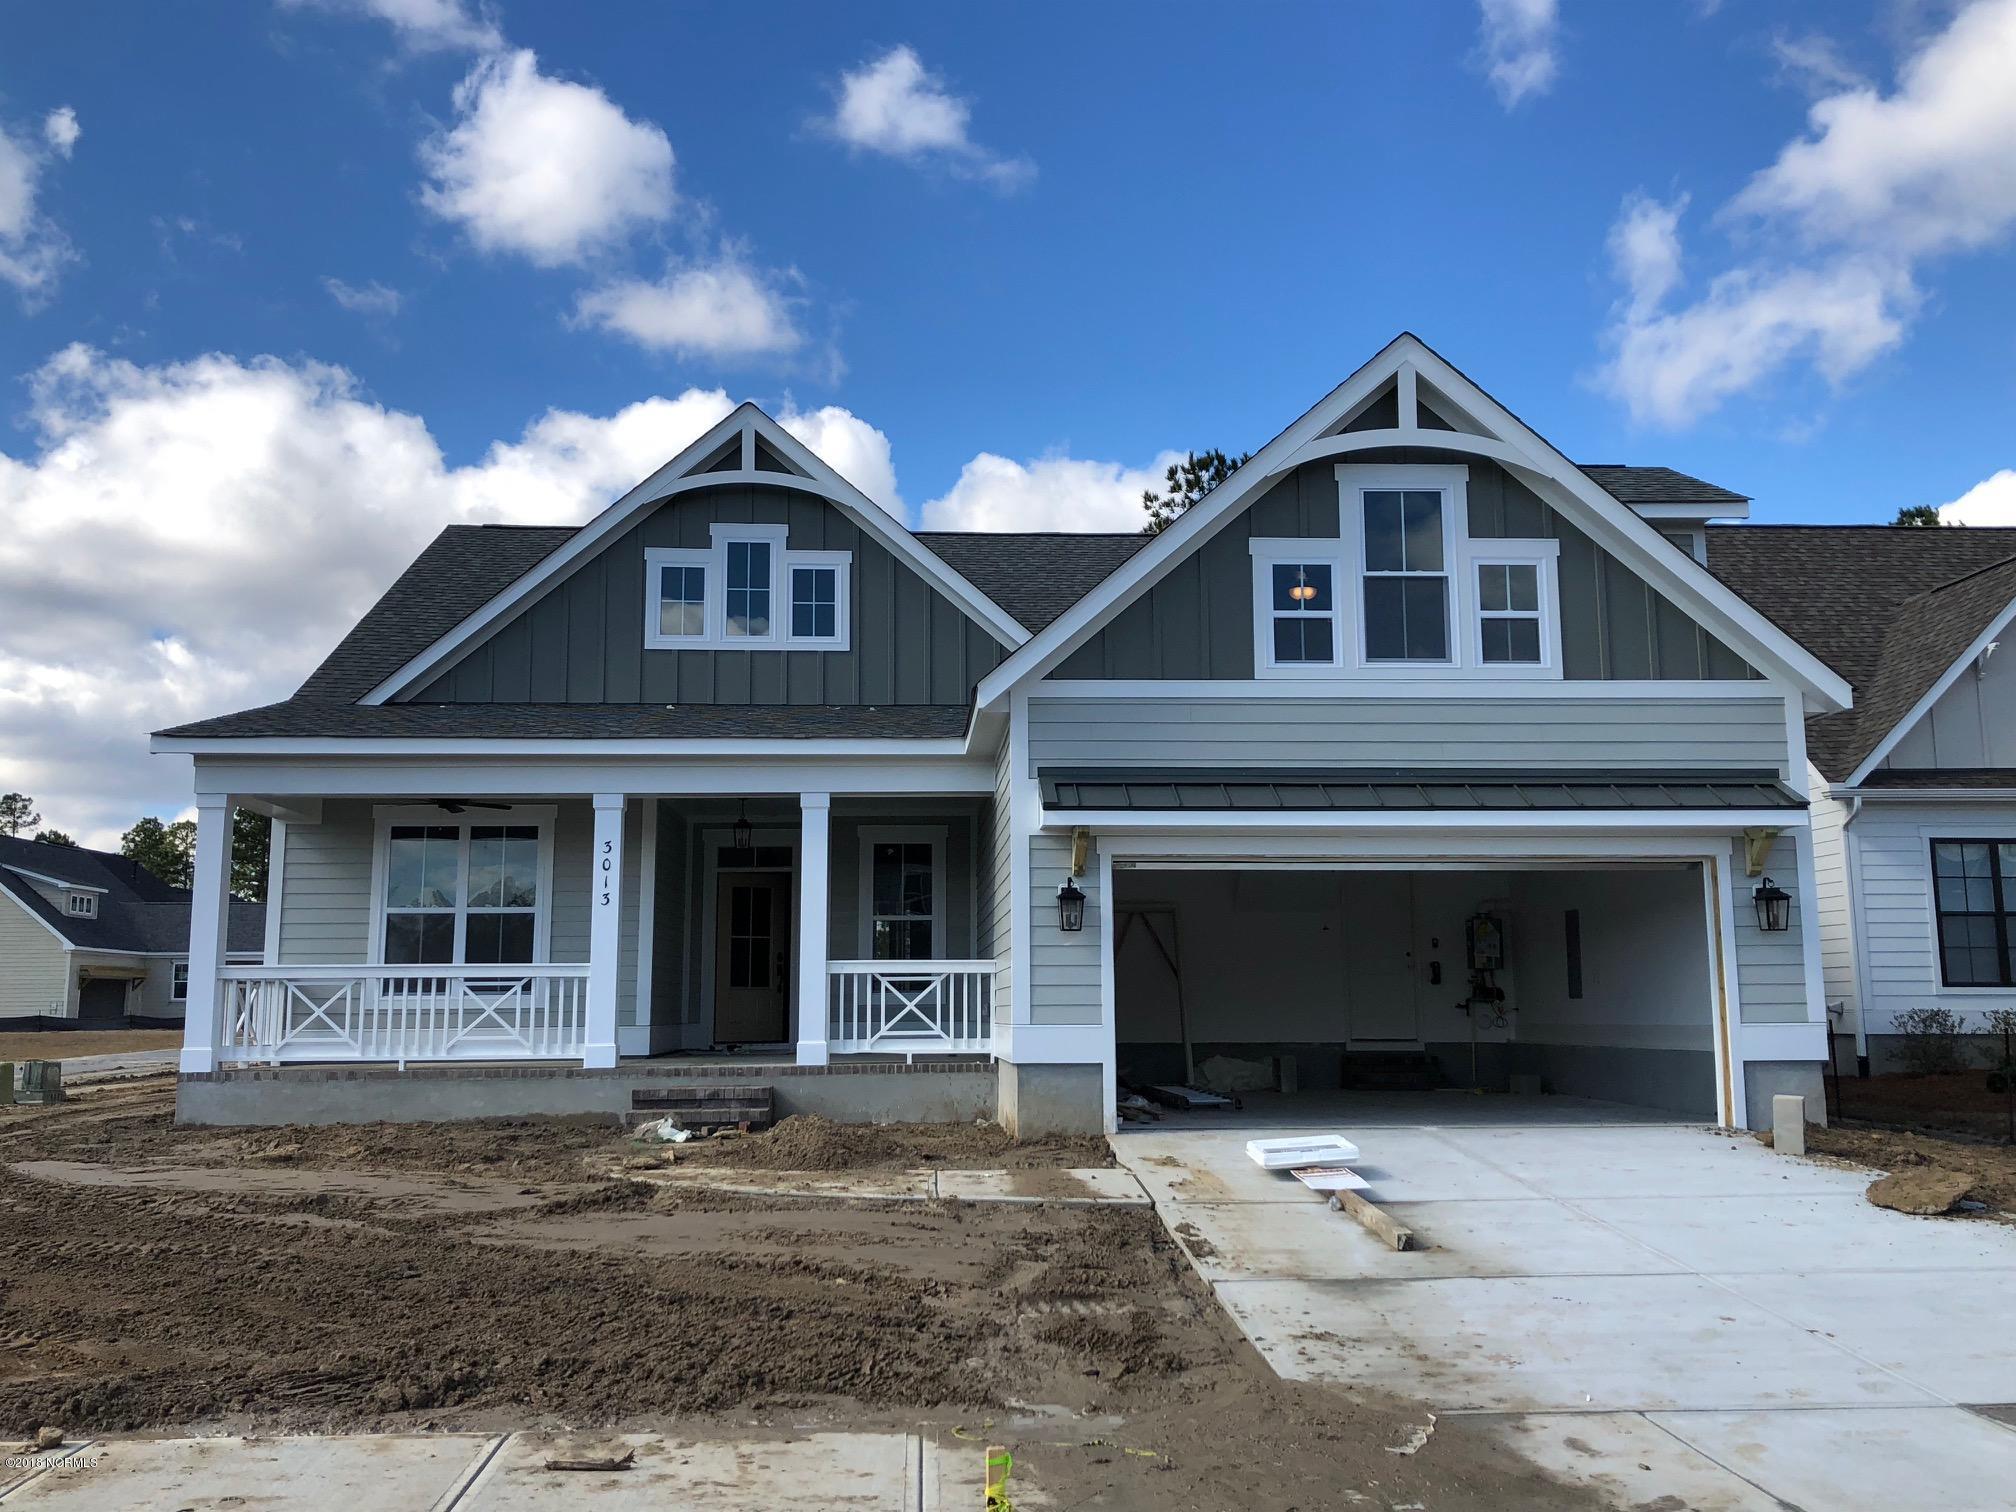 Carolina Plantations Real Estate - MLS Number: 100092605